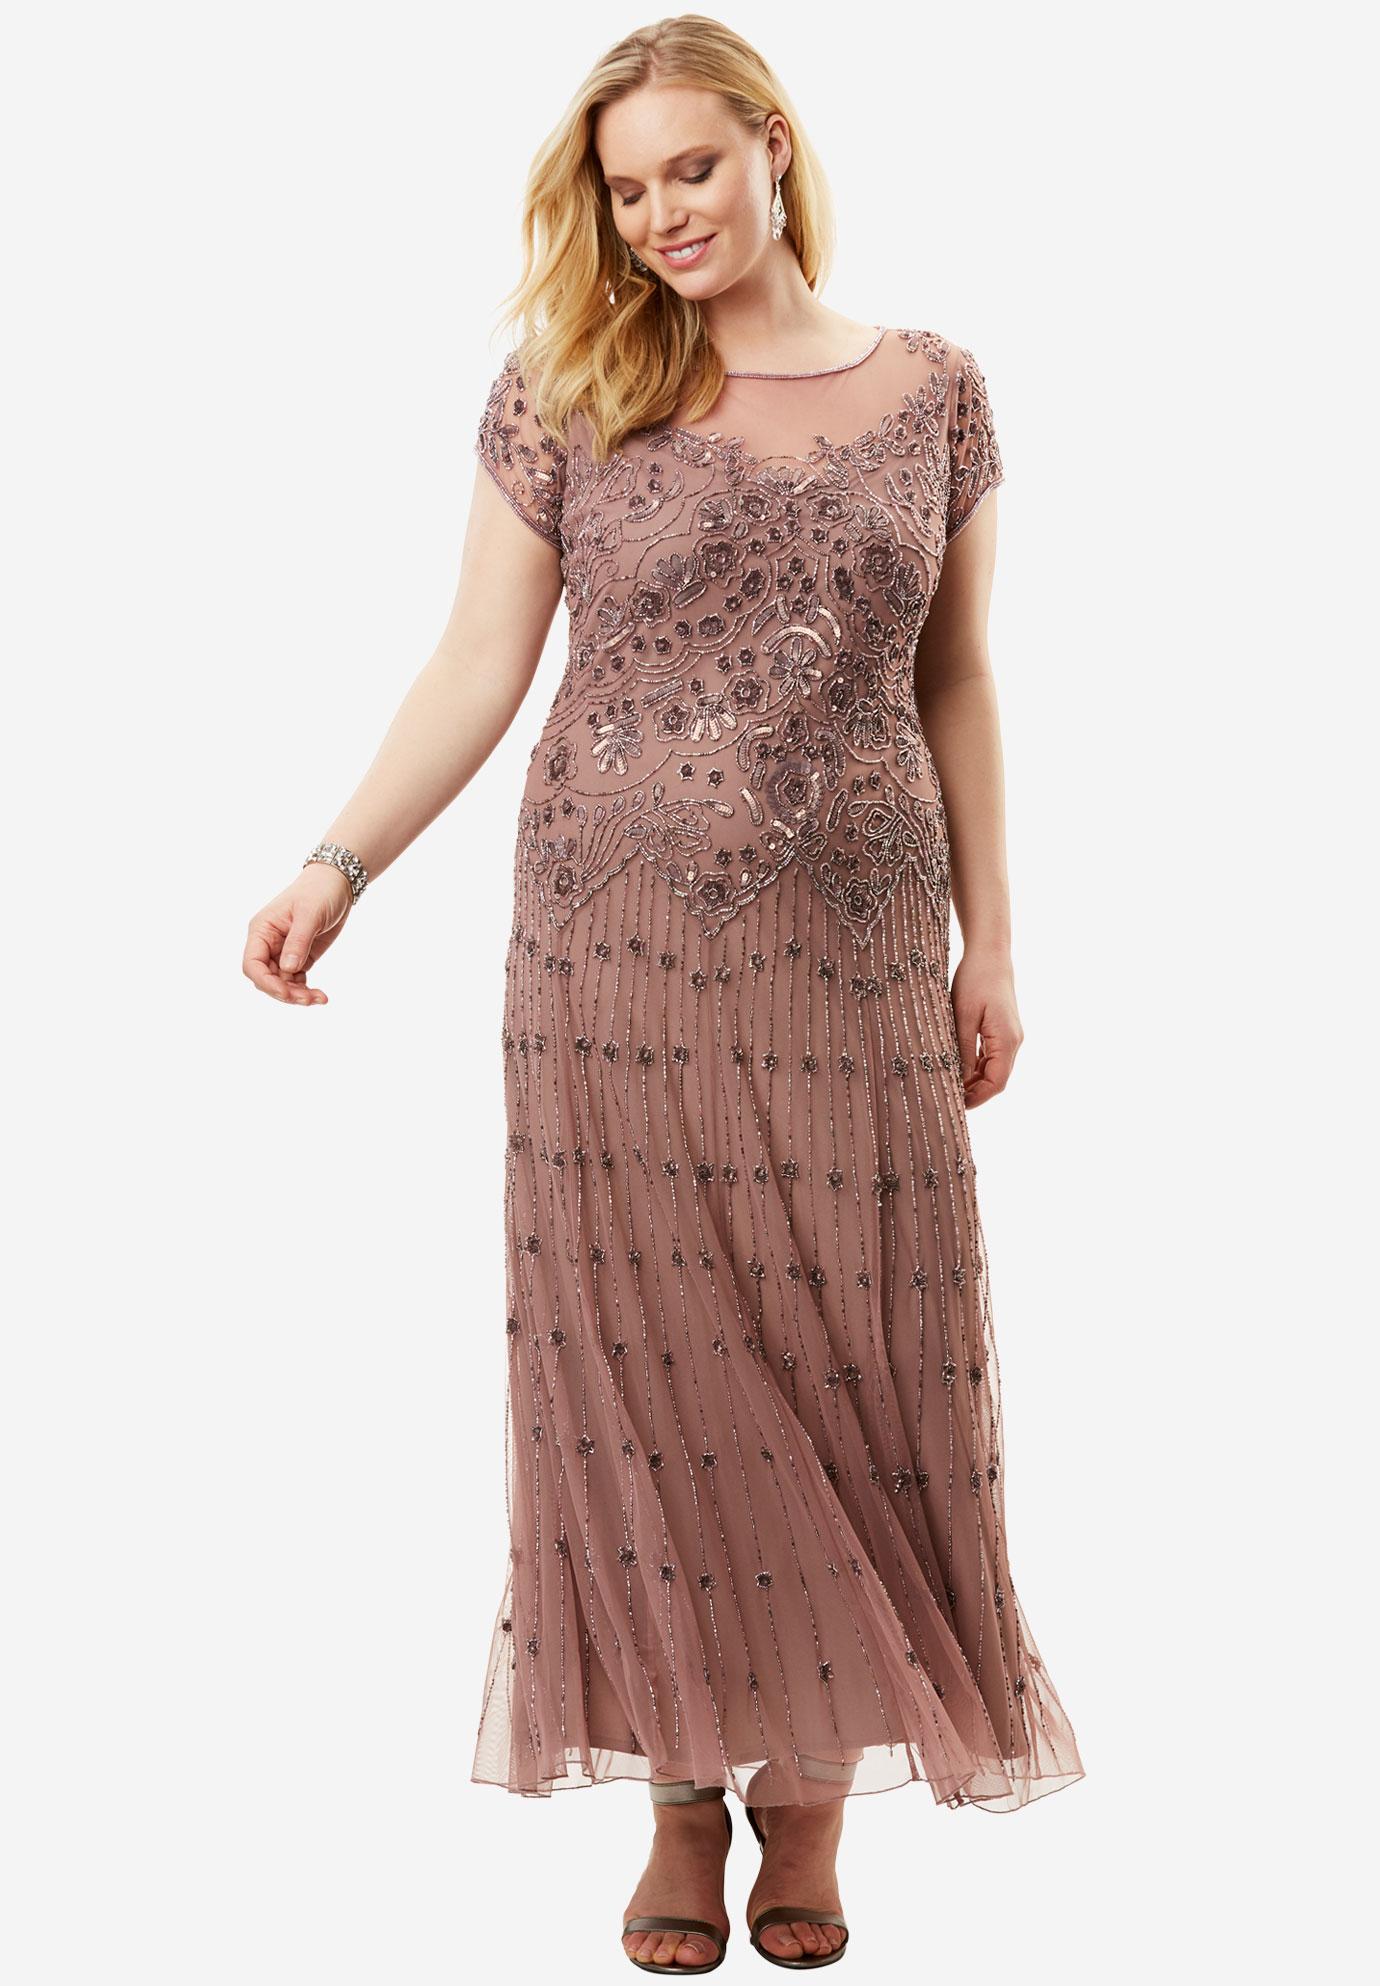 0c444eaa773 lllusion Beaded Mesh Dress by Pisarro Nights